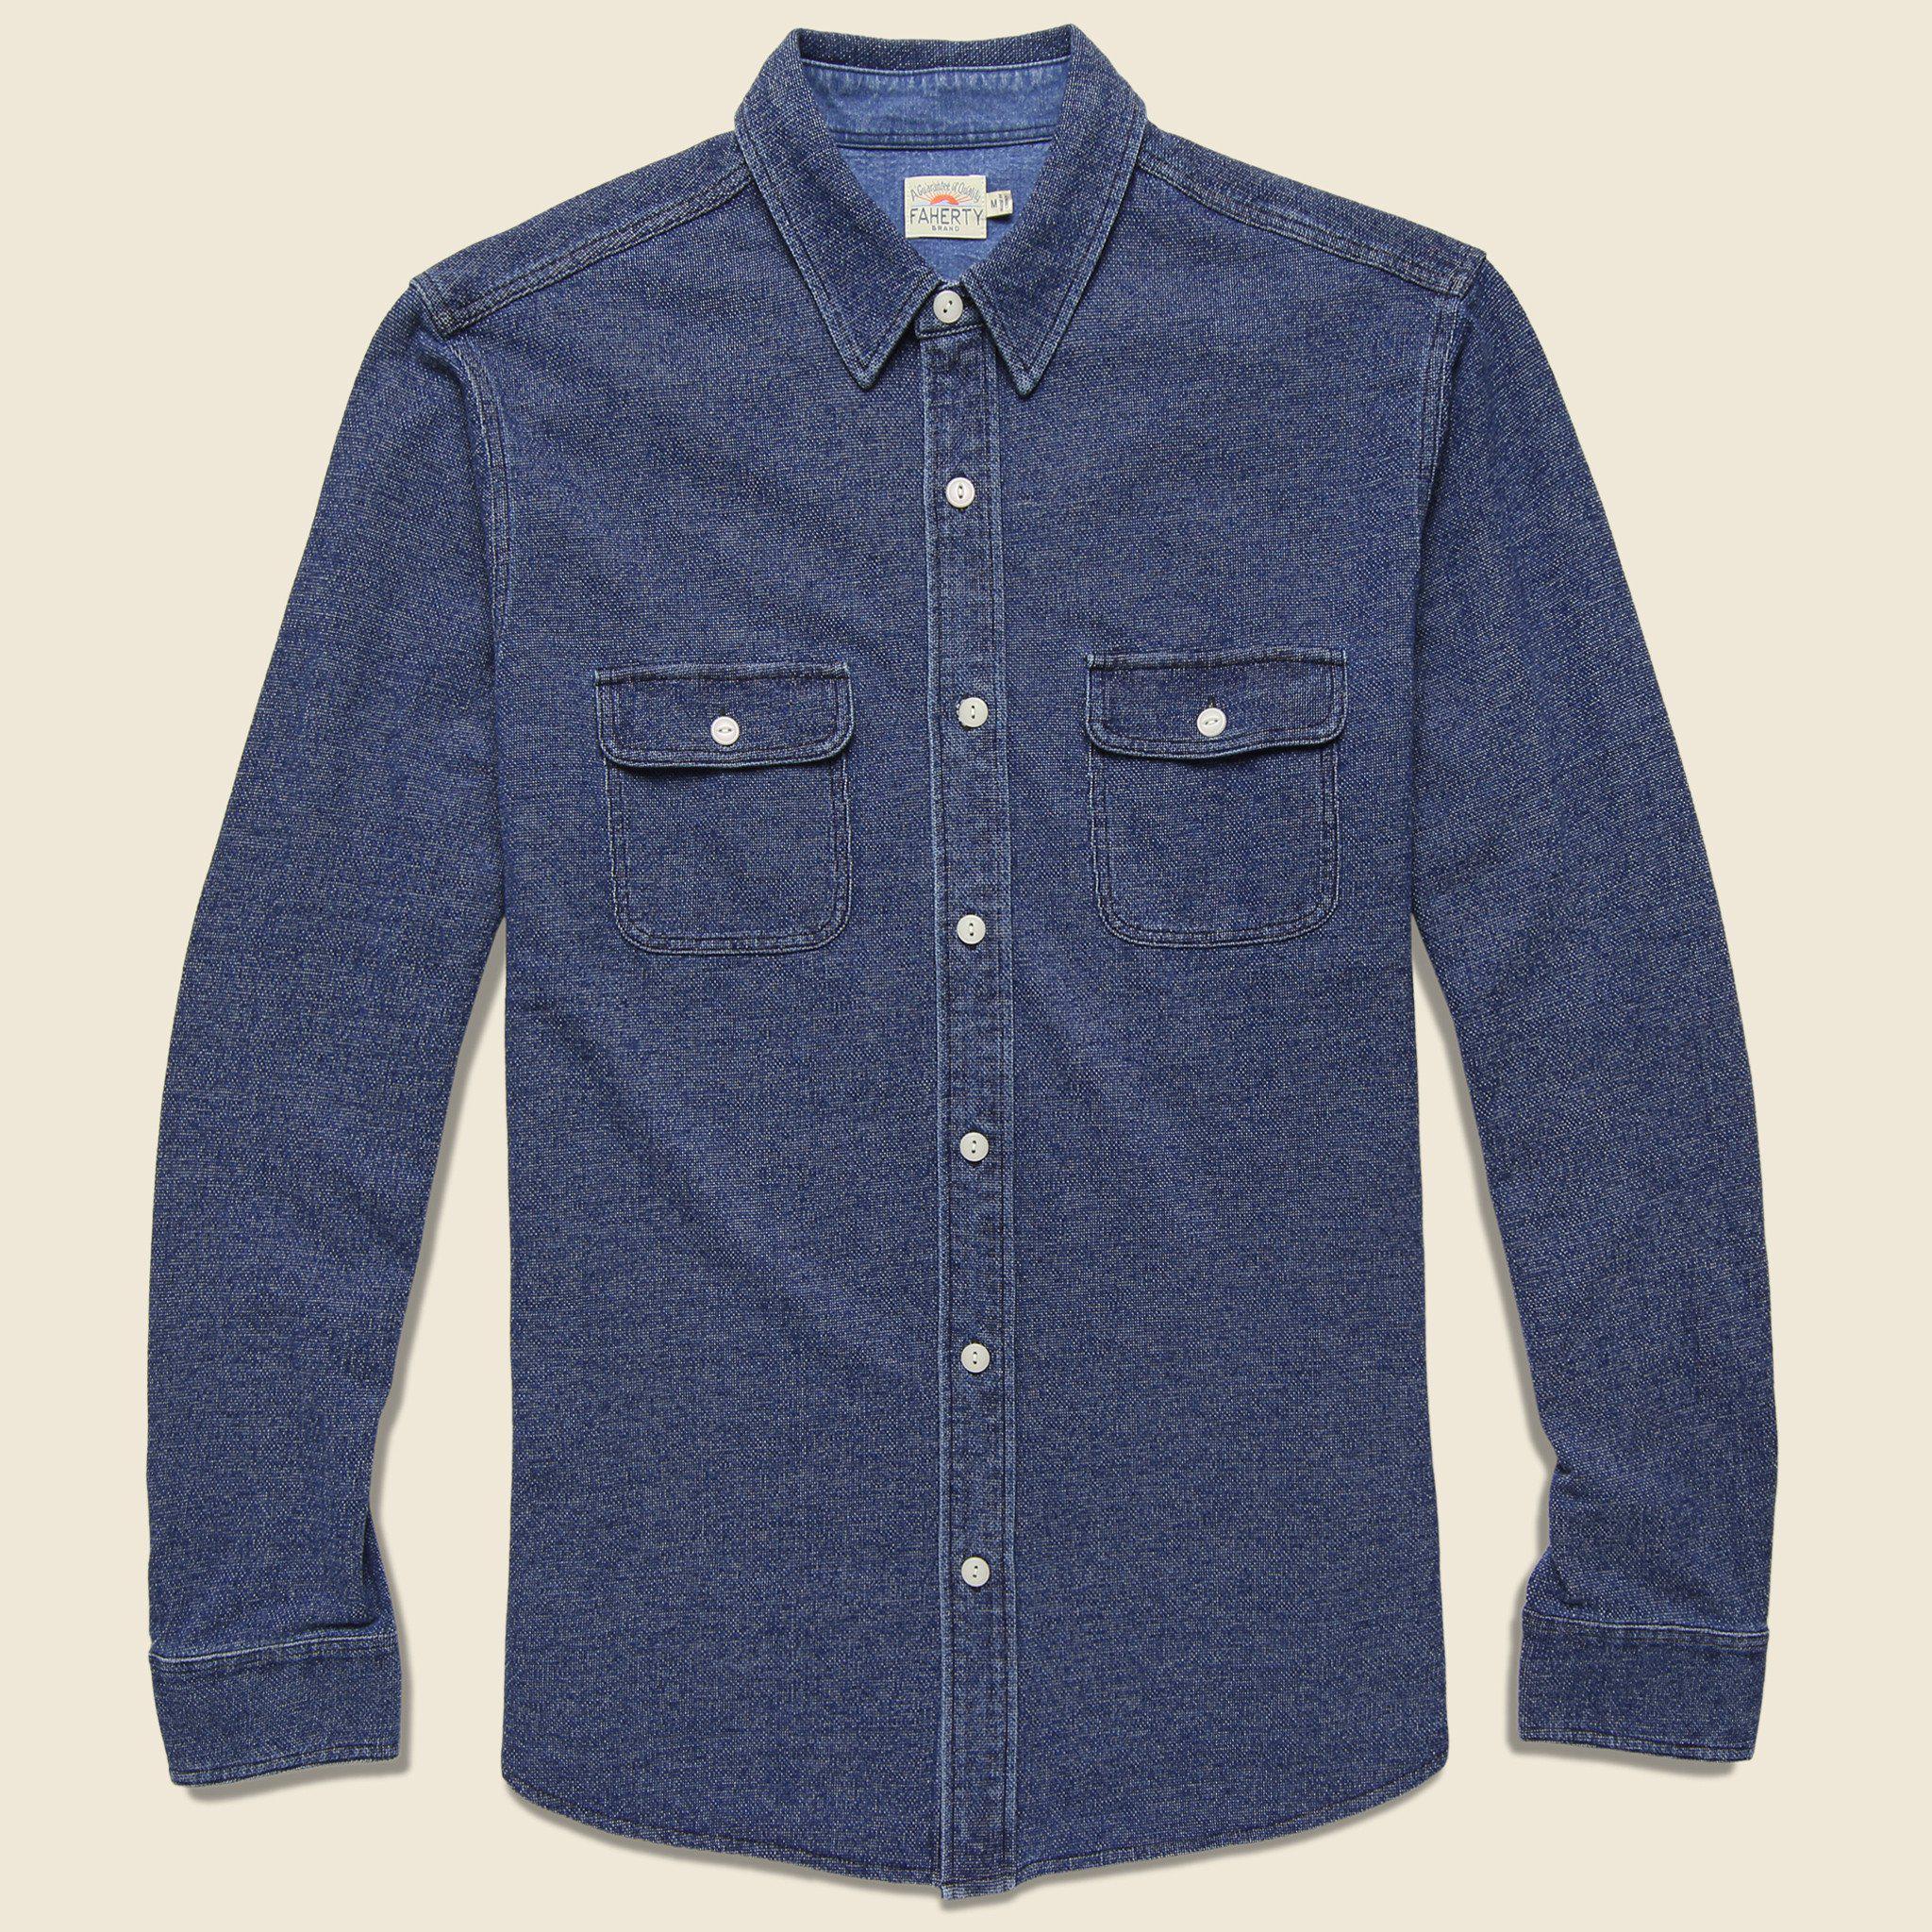 9bda34f7c3 Lyst - Faherty Brand Knit Belmar Shirt - Medium Indigo in Blue for Men